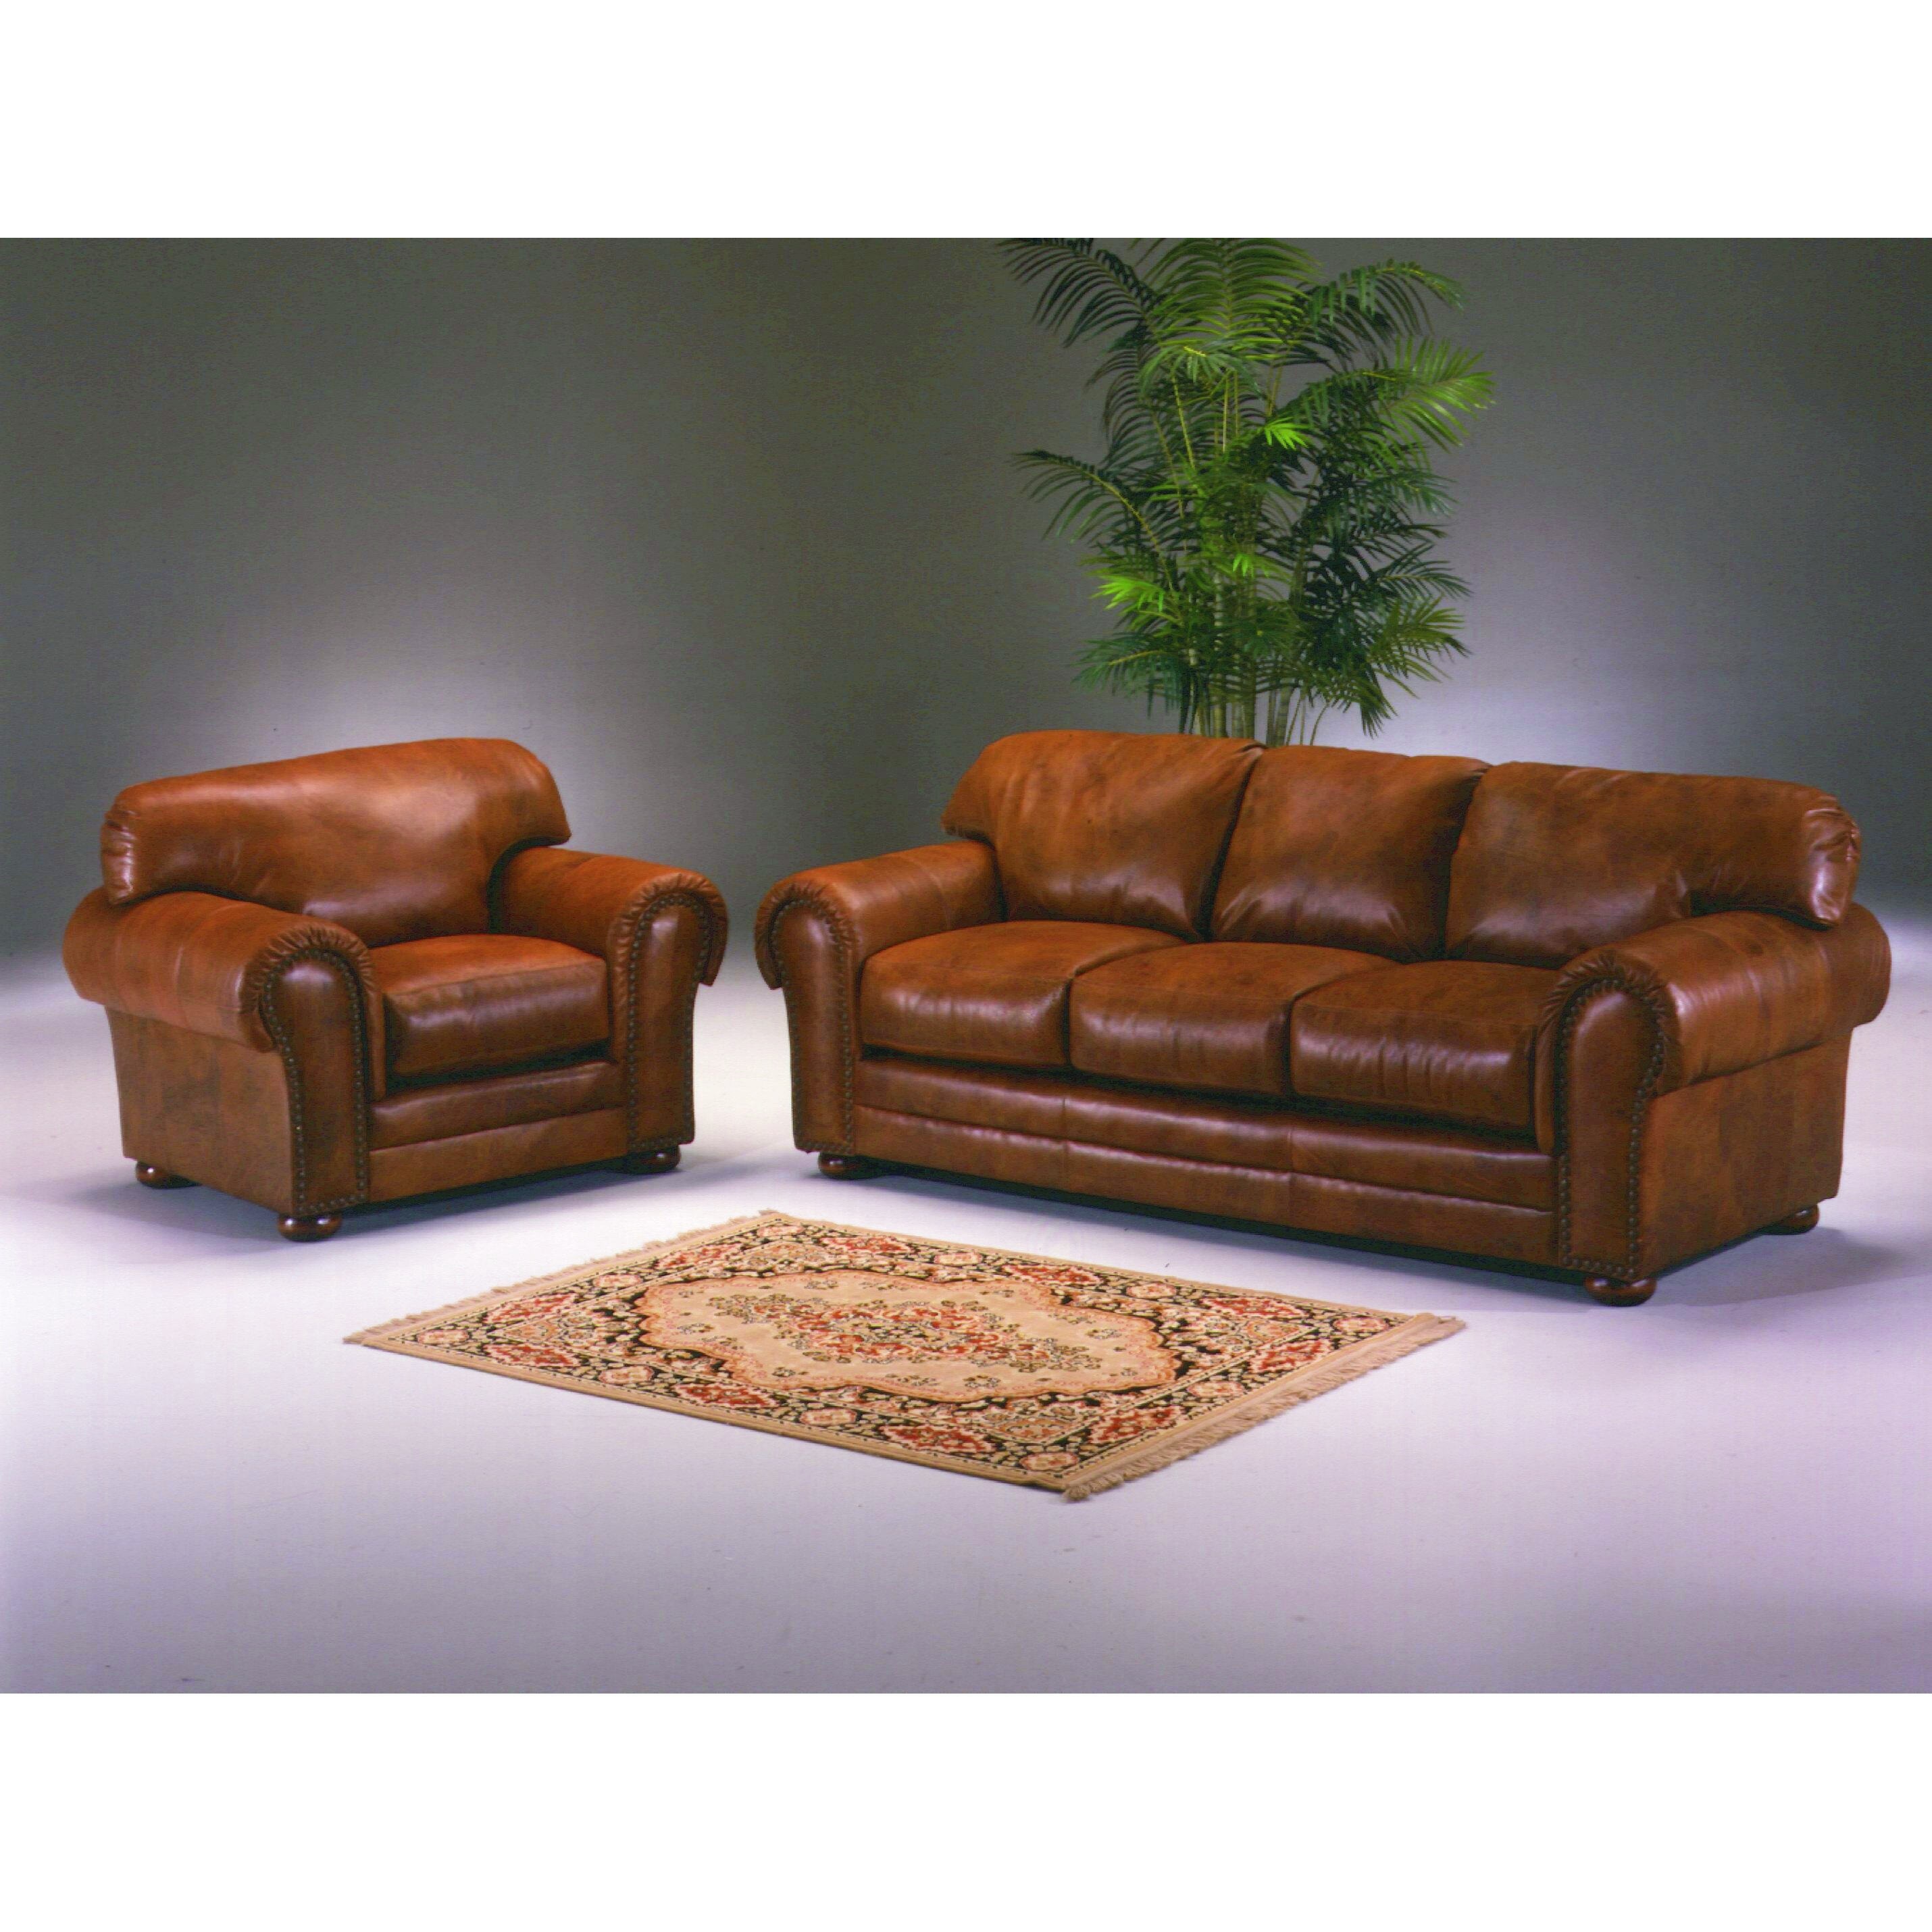 Omnia Leather Cheyenne 3 Seat Leather Sofa Set Reviews Wayfair